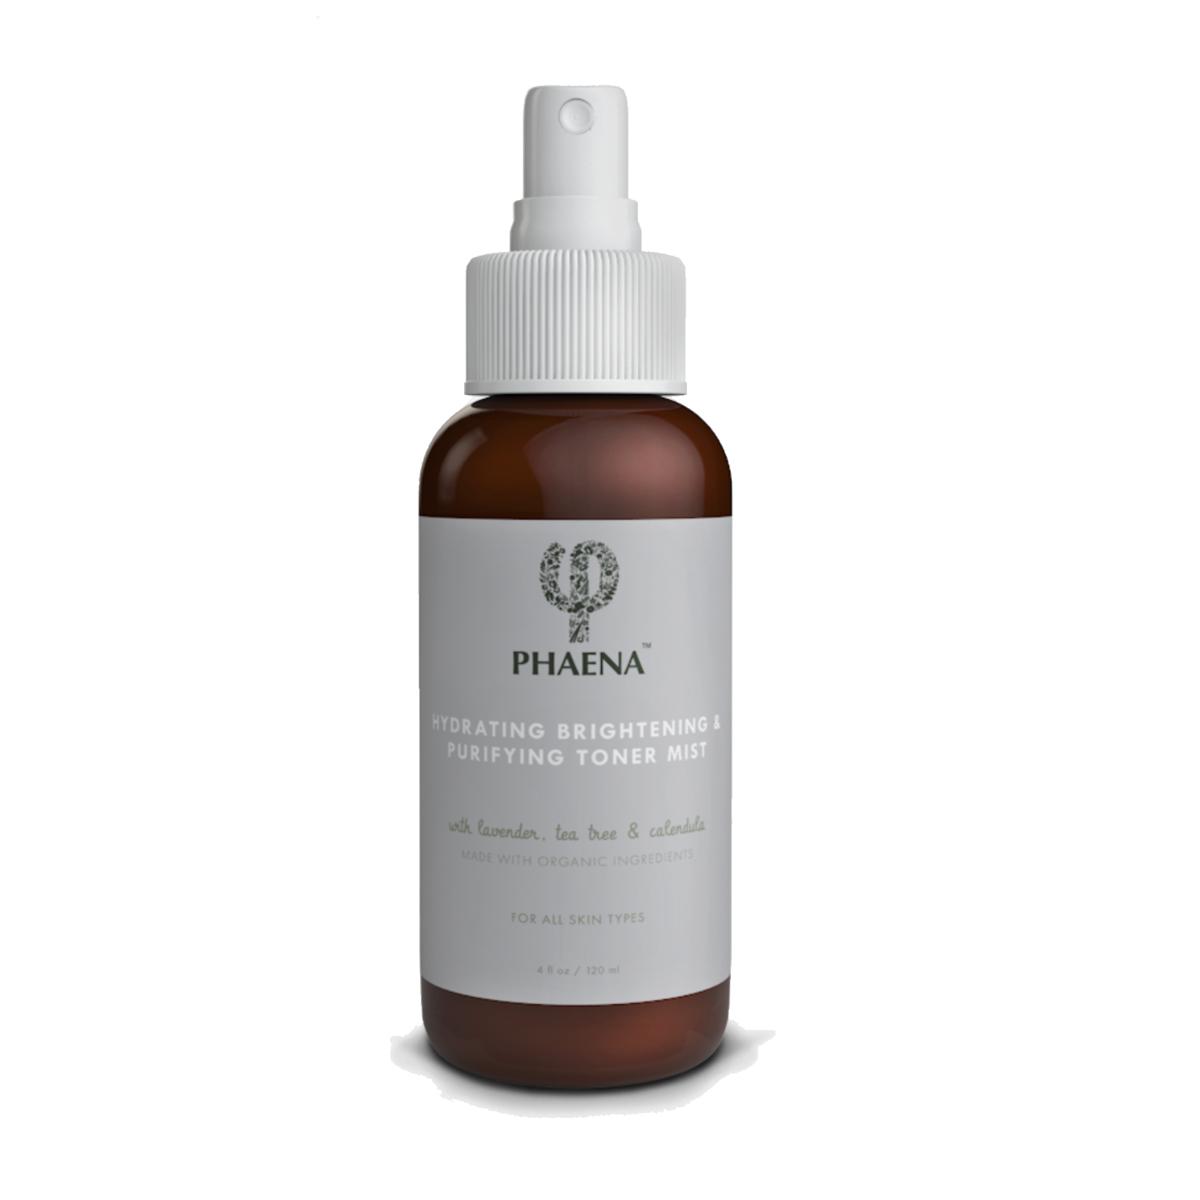 Phaena Hydrating Brightening & Purifying Toner Mist - with Lavender, Tea Tree & Calendula   Alcohol-Free   Made with Organic Ingredients   Antioxidants - 4.0 oz Spray Bottle